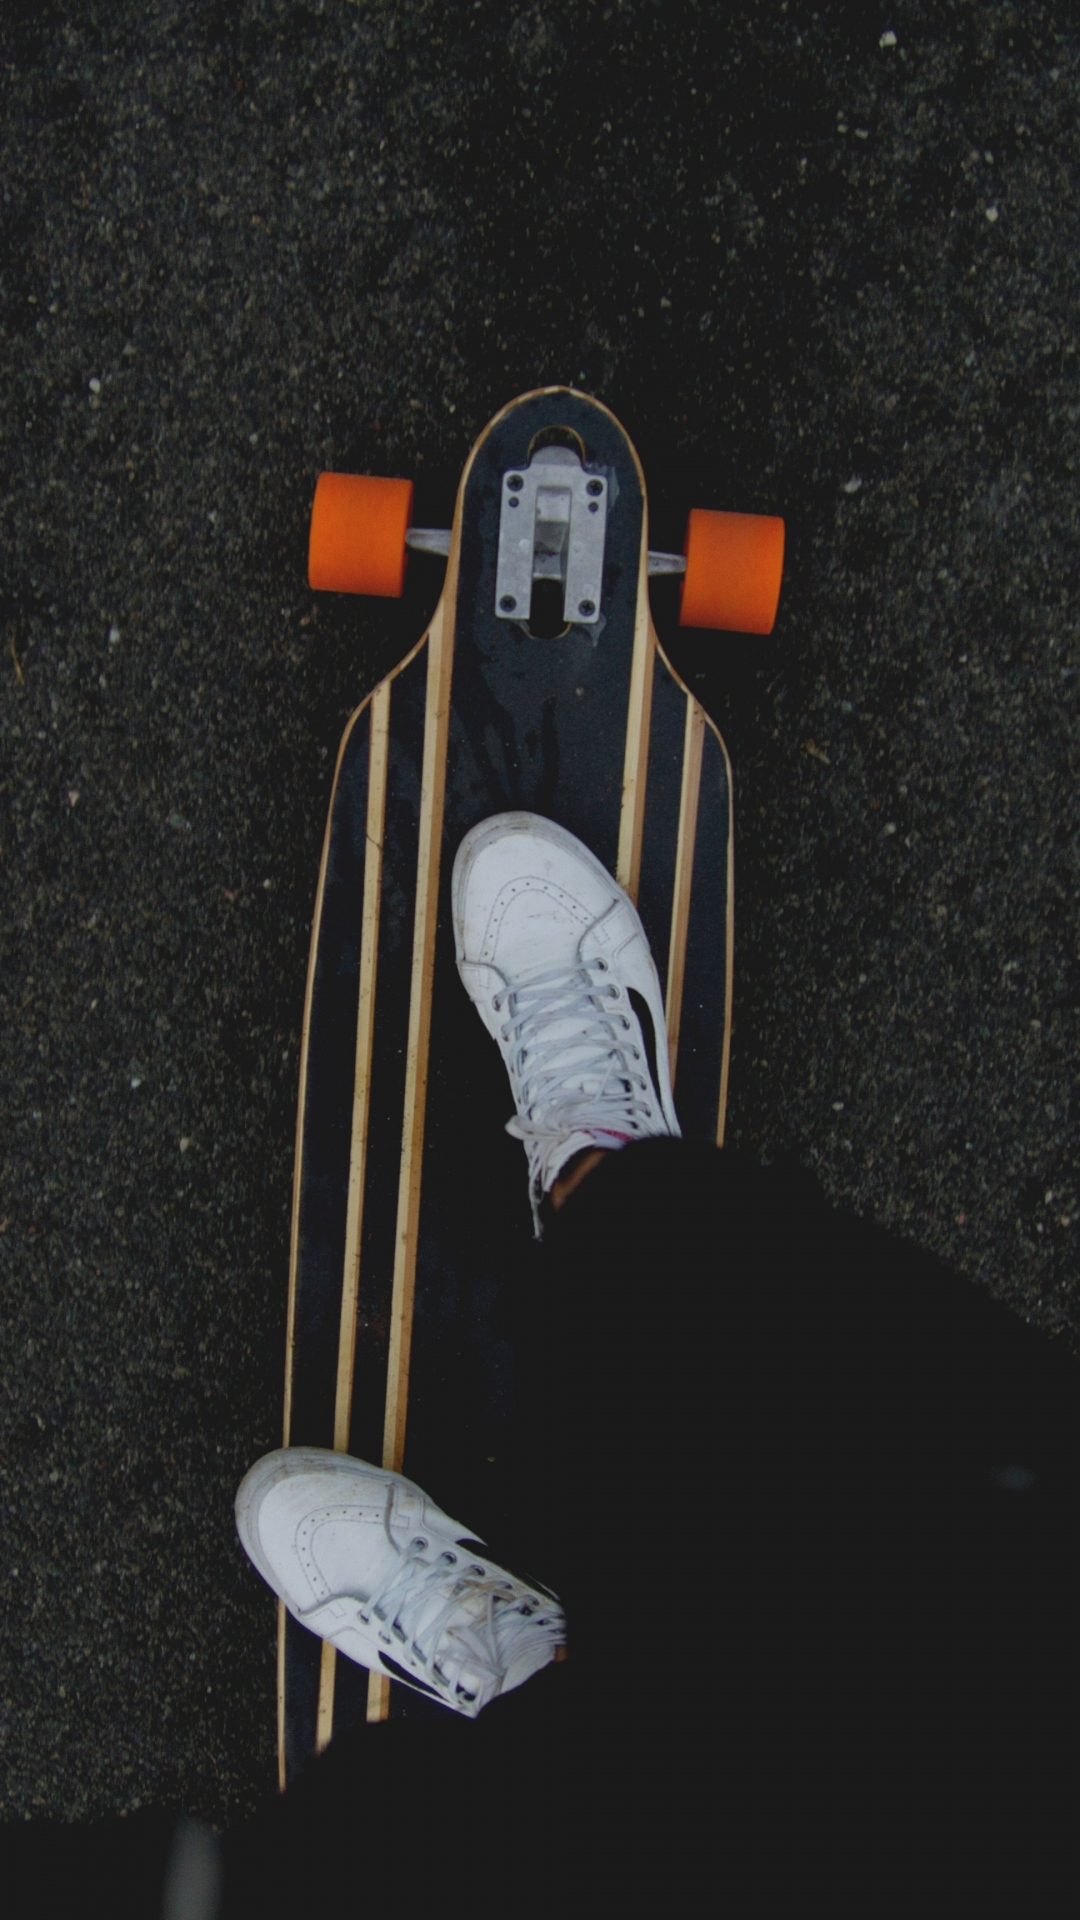 iphone wallpaper skateboard legs 3Wallpapers : notre sélection de fonds d'écran du 09/11/2017